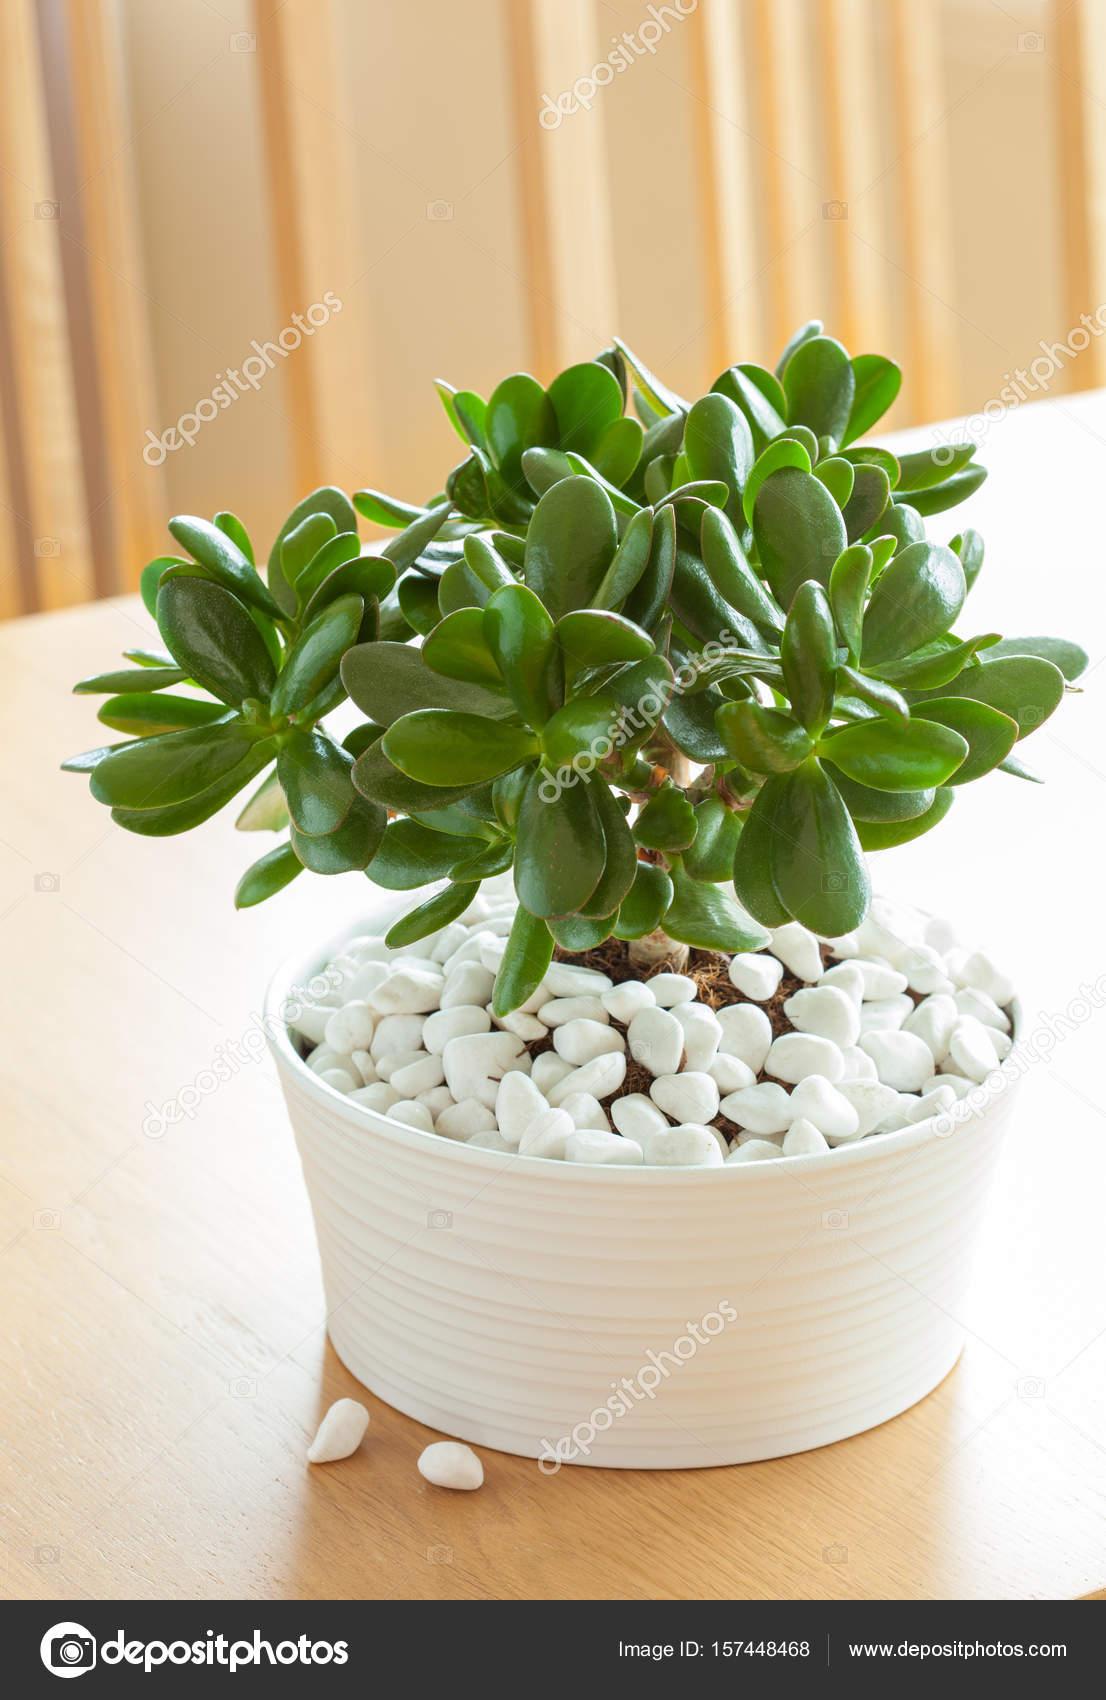 Houseplant Crassula Ovata Jade Plant Money Tree In White Pot Stock